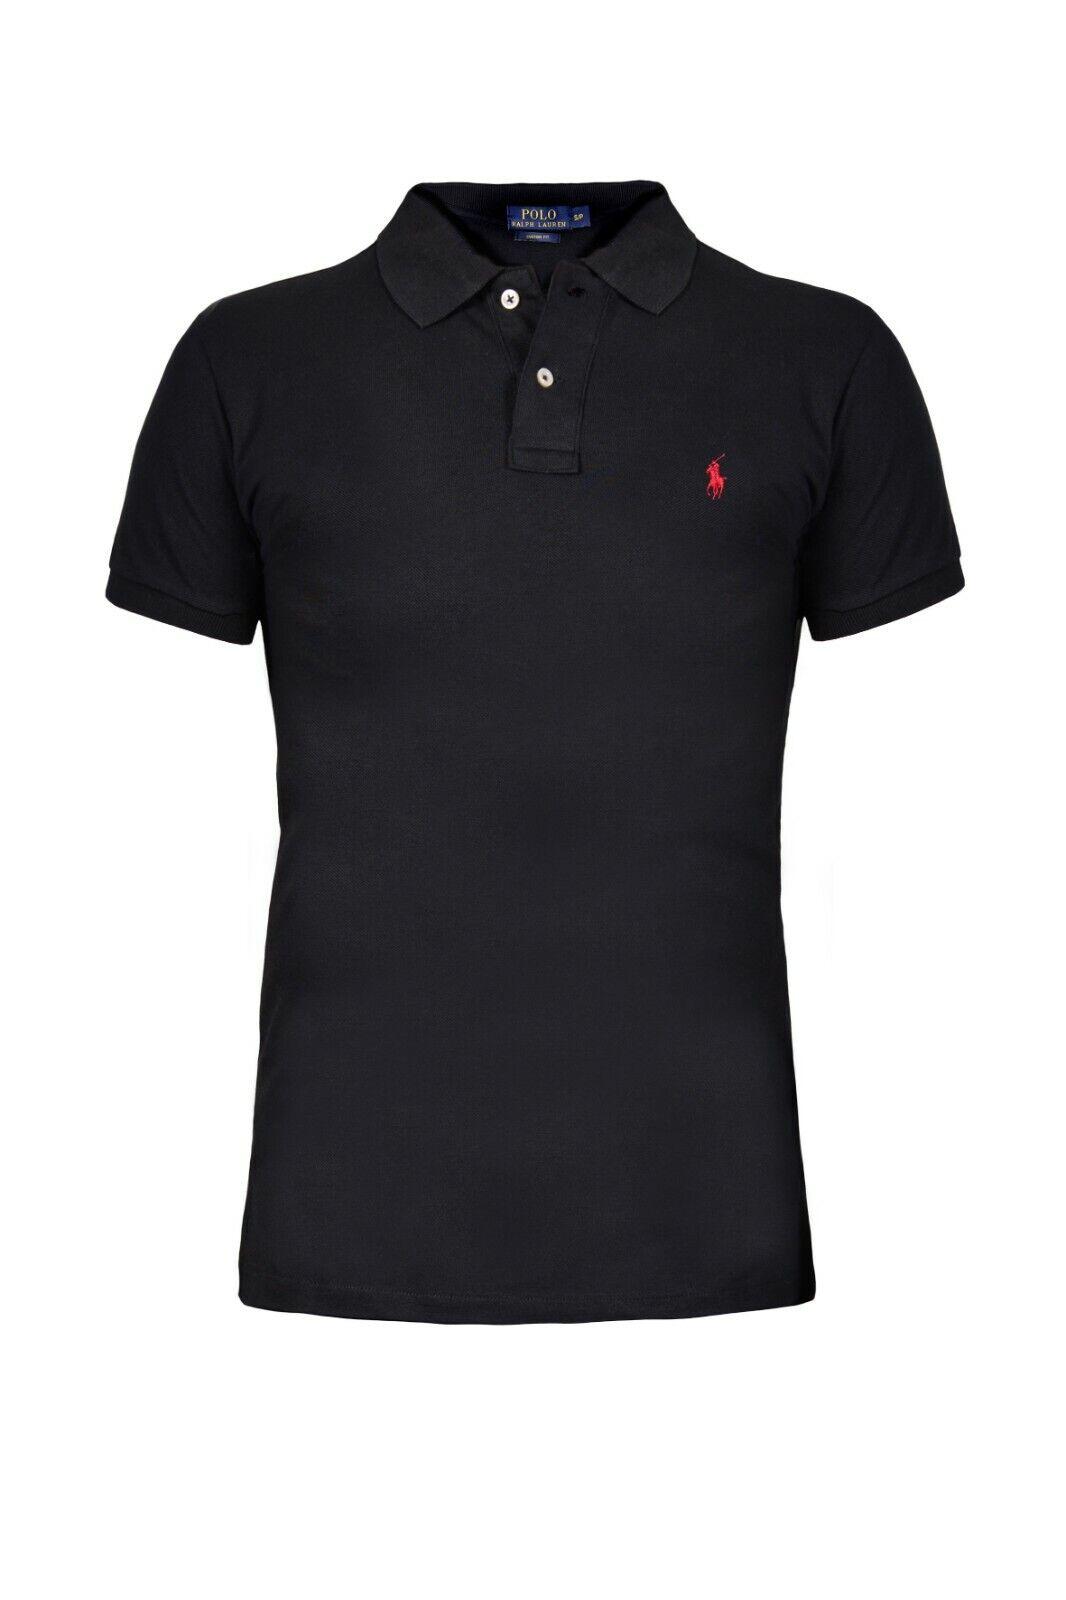 Ralph Lauren, Herren Poloshirt, OVP, Custom Fit, Neu, Schwarz